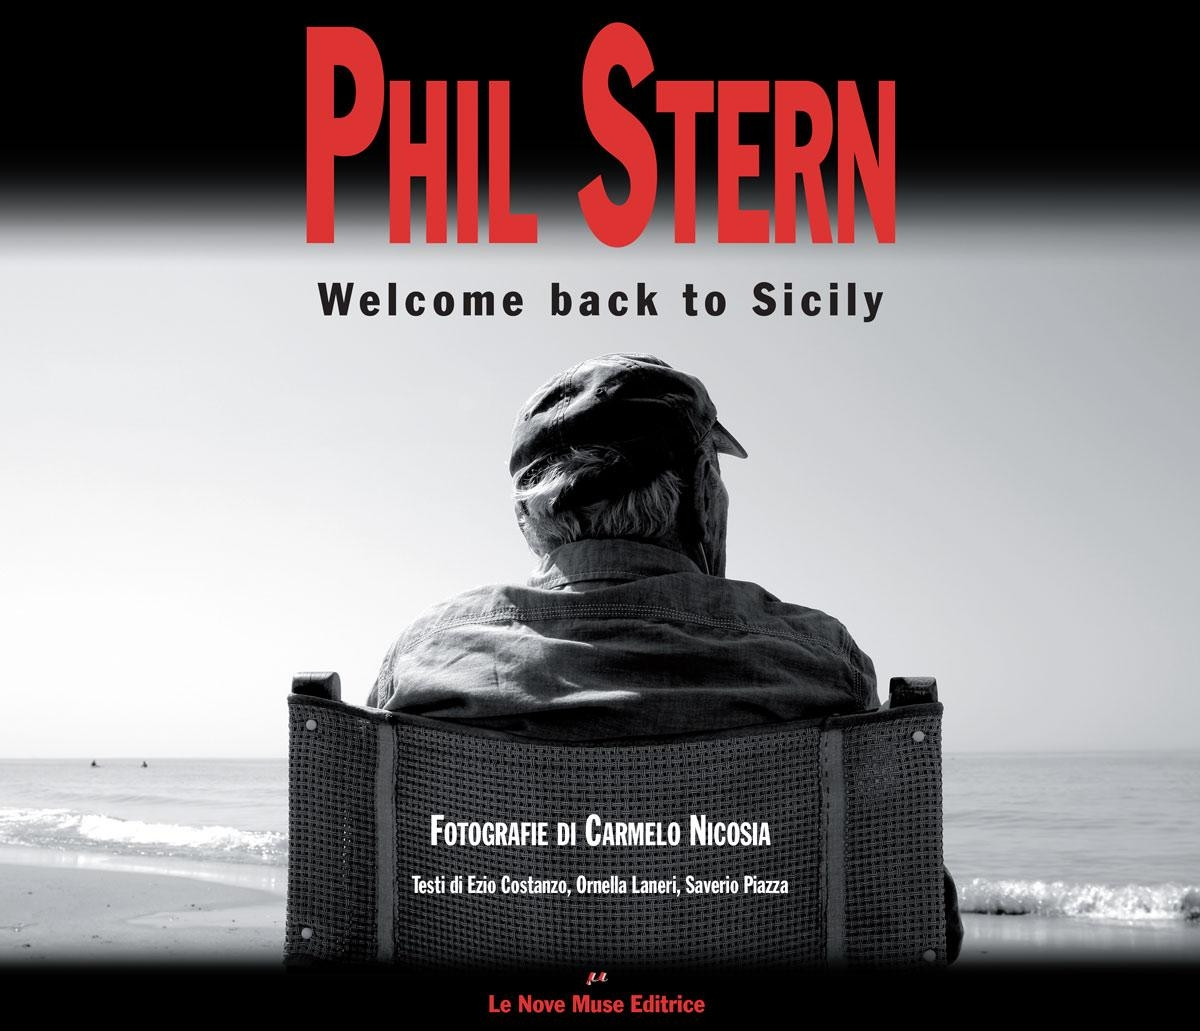 Phil Stern